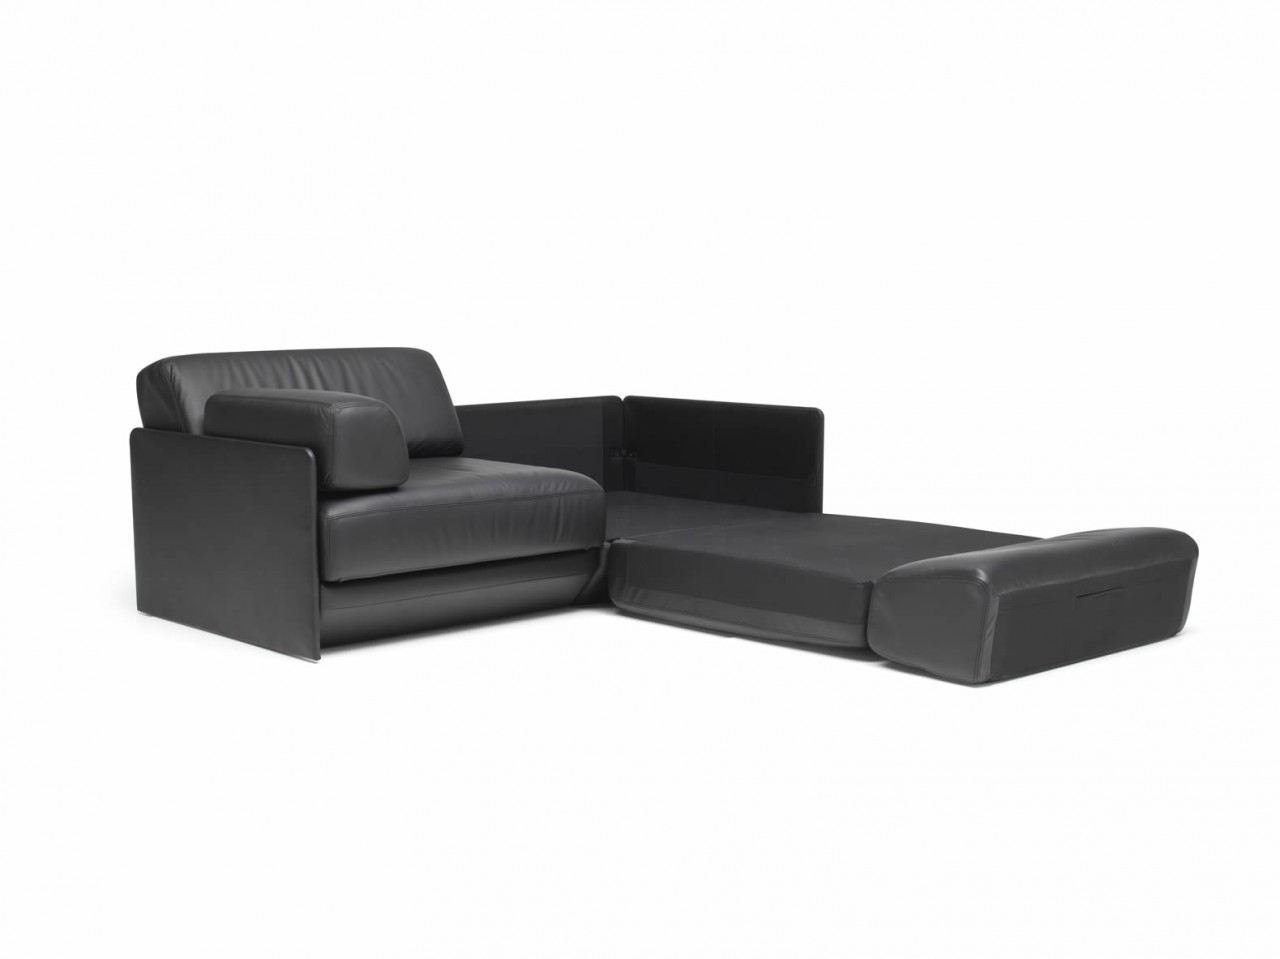 Full Size of De Sede Sofa Furniture Usa For Sale Bed Uk Gebraucht Preis Sessel Schweiz Kaufen Endless Ds 600 Bi 47 Preise Preisliste Leder Wohnzimmer Bilder Xxl Togo Sofa De Sede Sofa